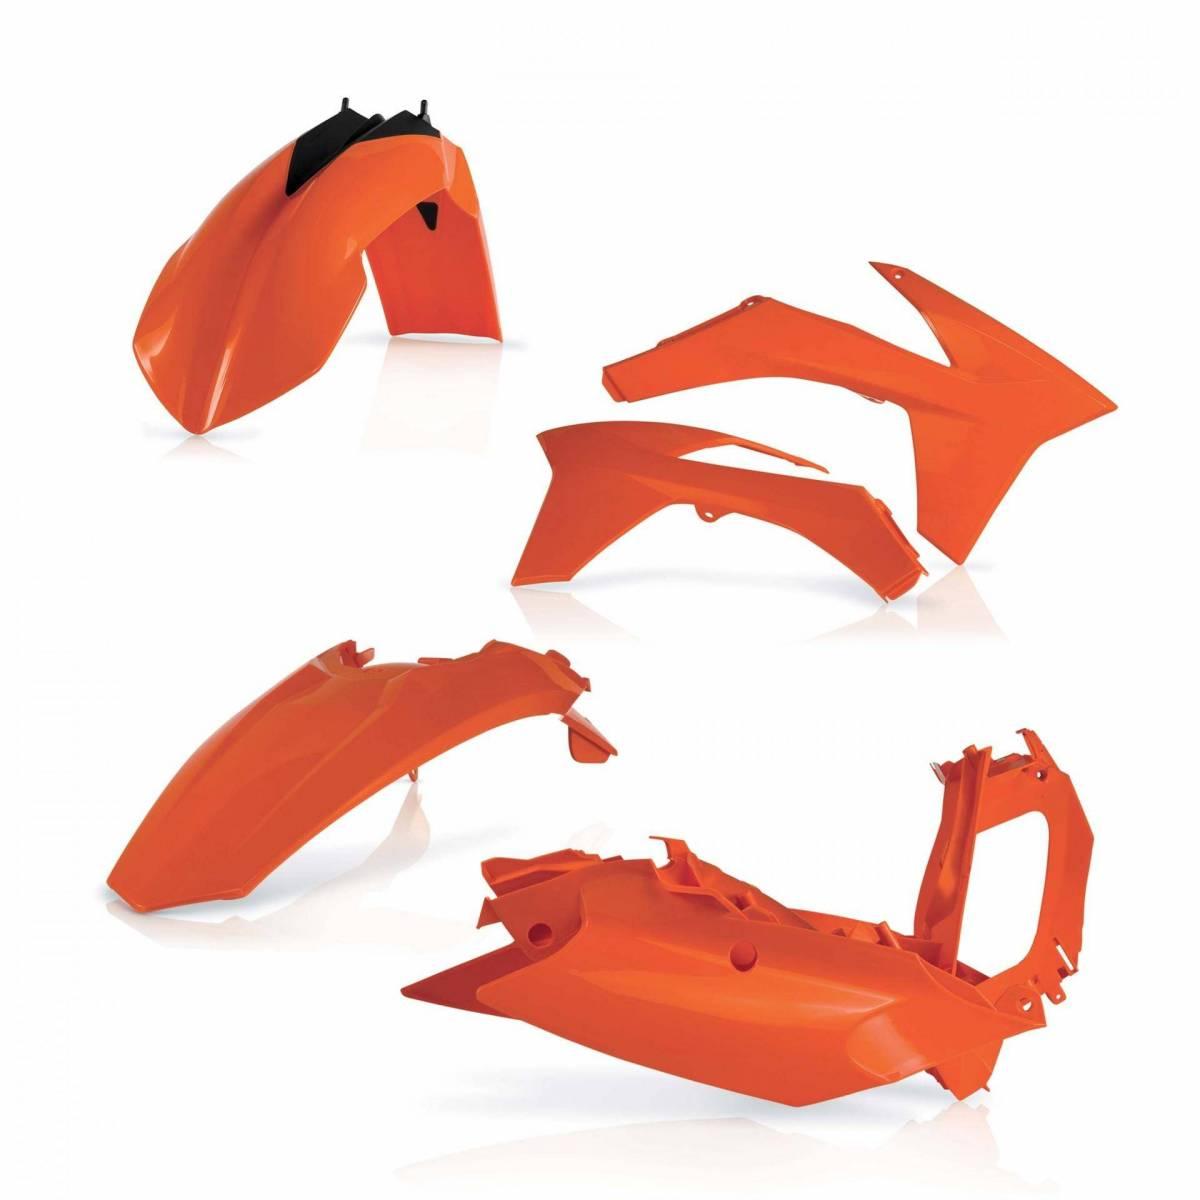 0015705-553 - Kit Plasticos Sx 125 11 12 Origen